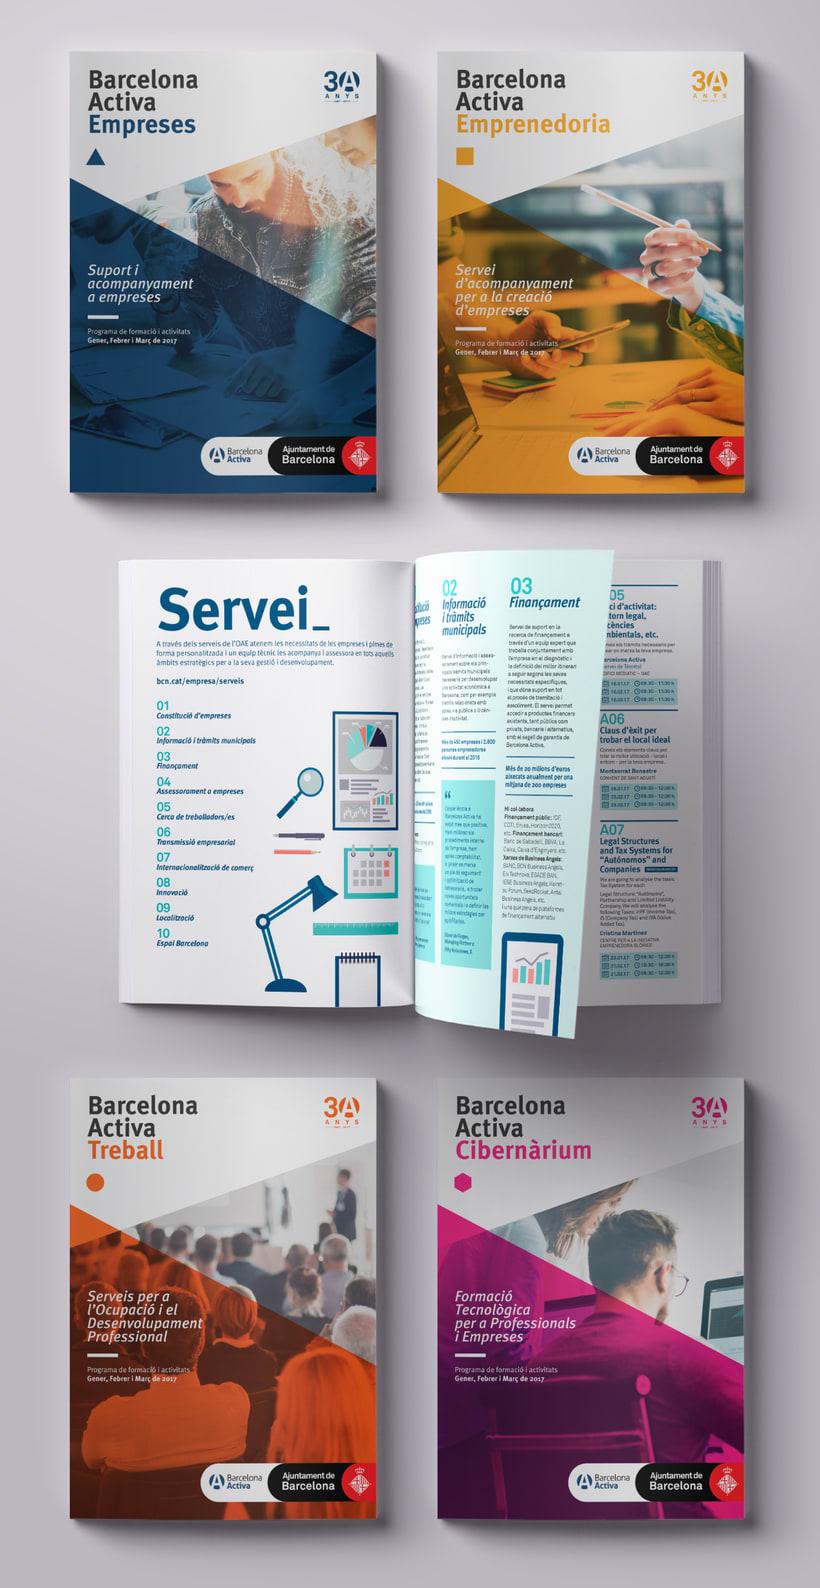 Barcelona Activa Empreses 2